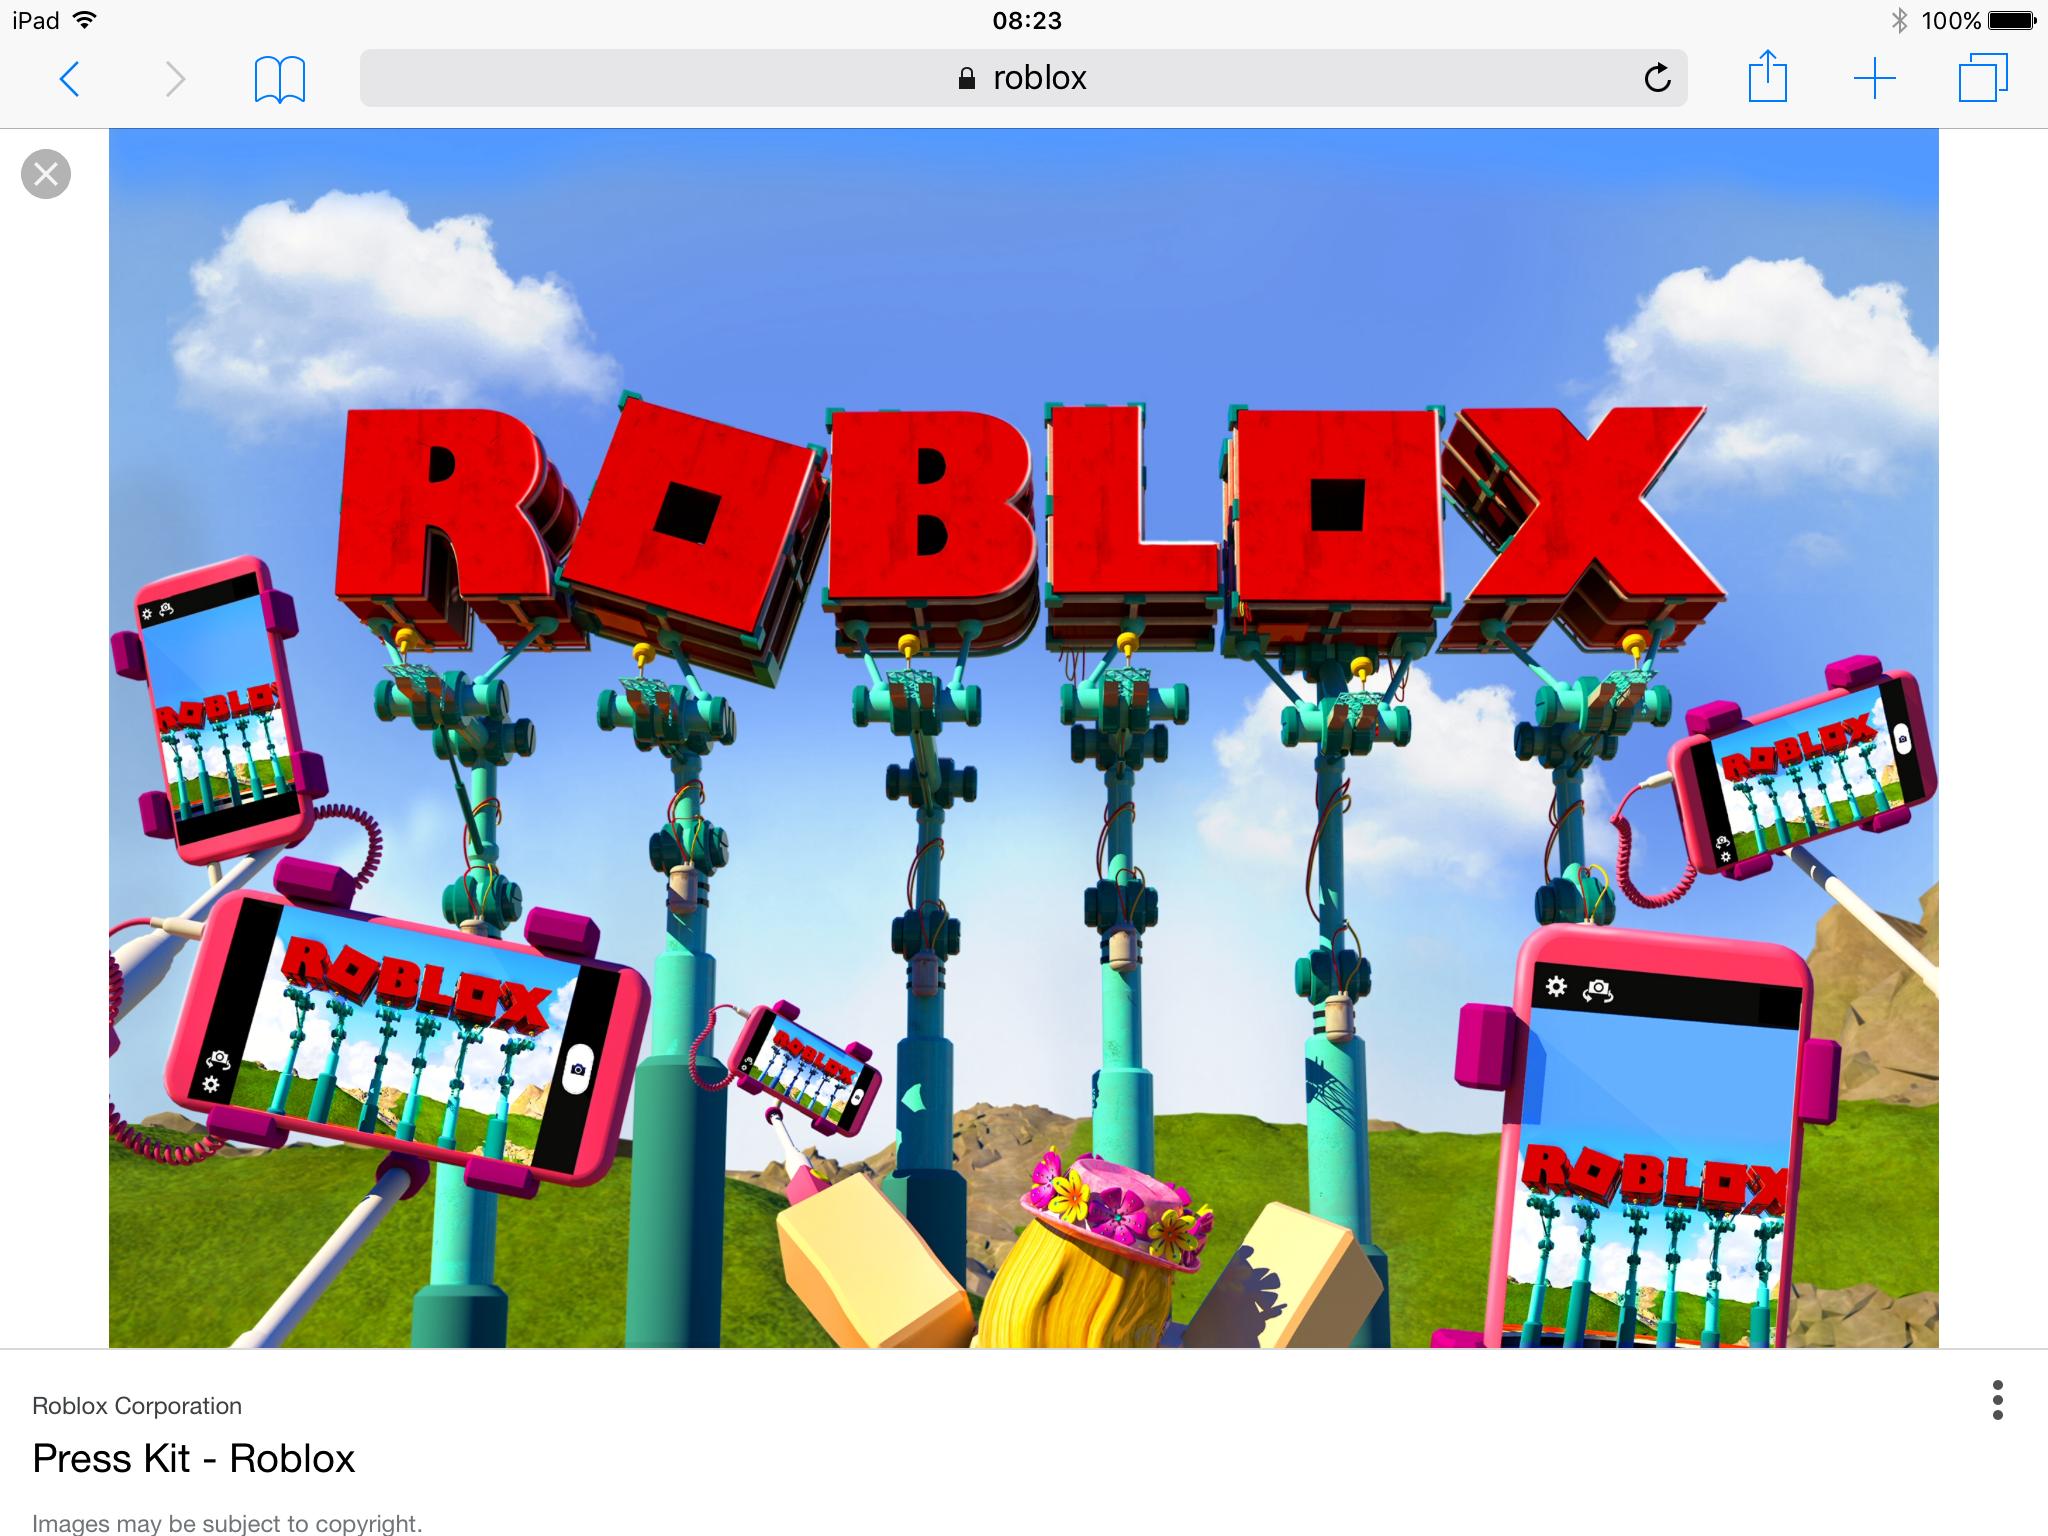 Ipad Wallpaper Roblox